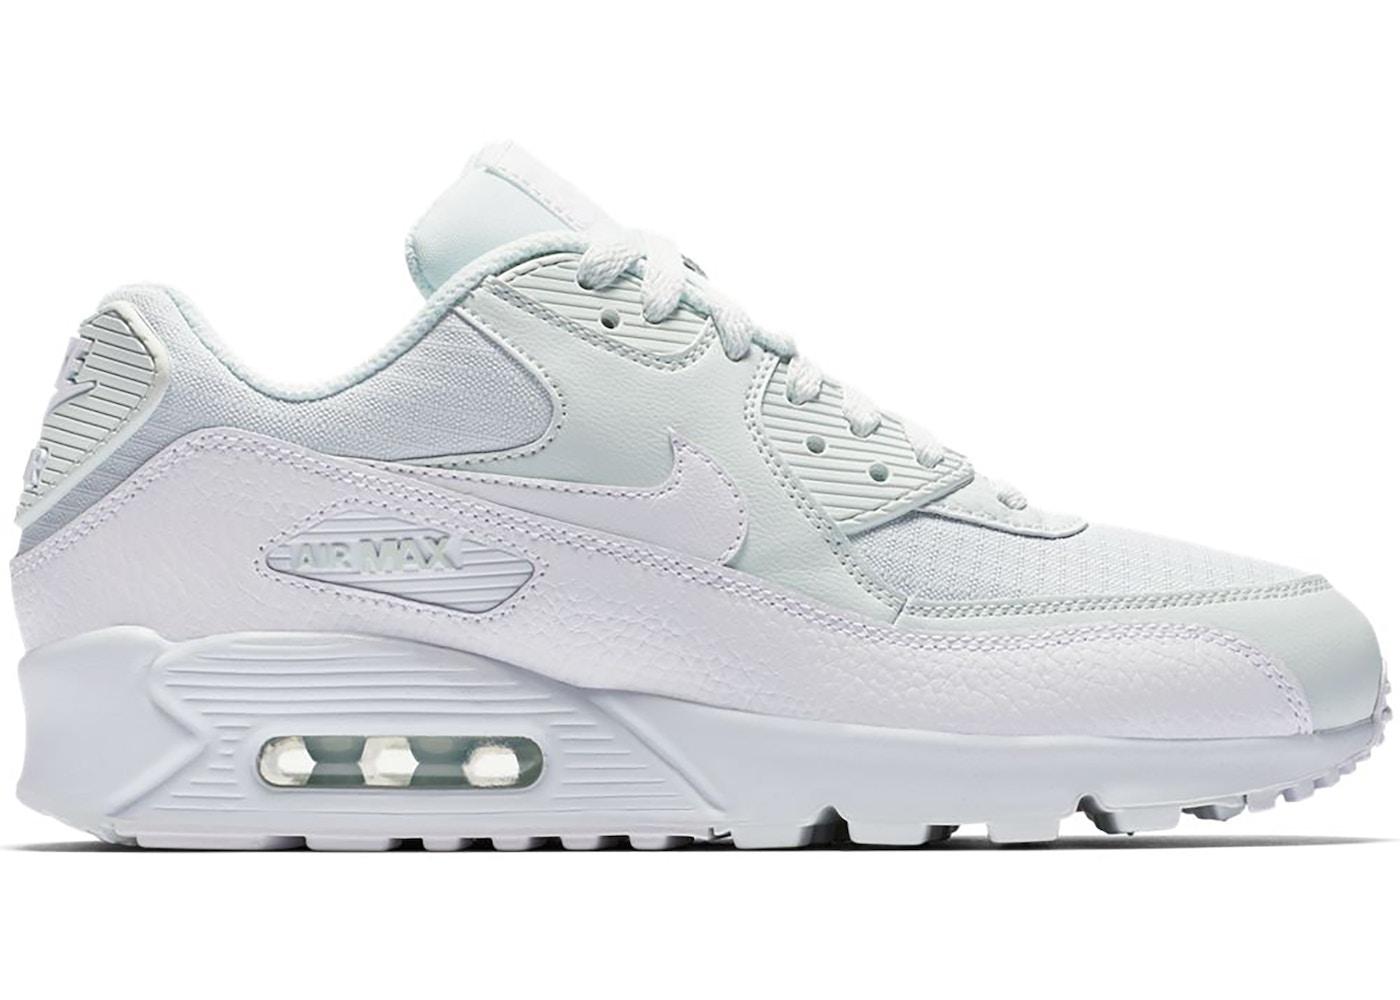 Nike Air Max 90 Ghost Aqua (W)